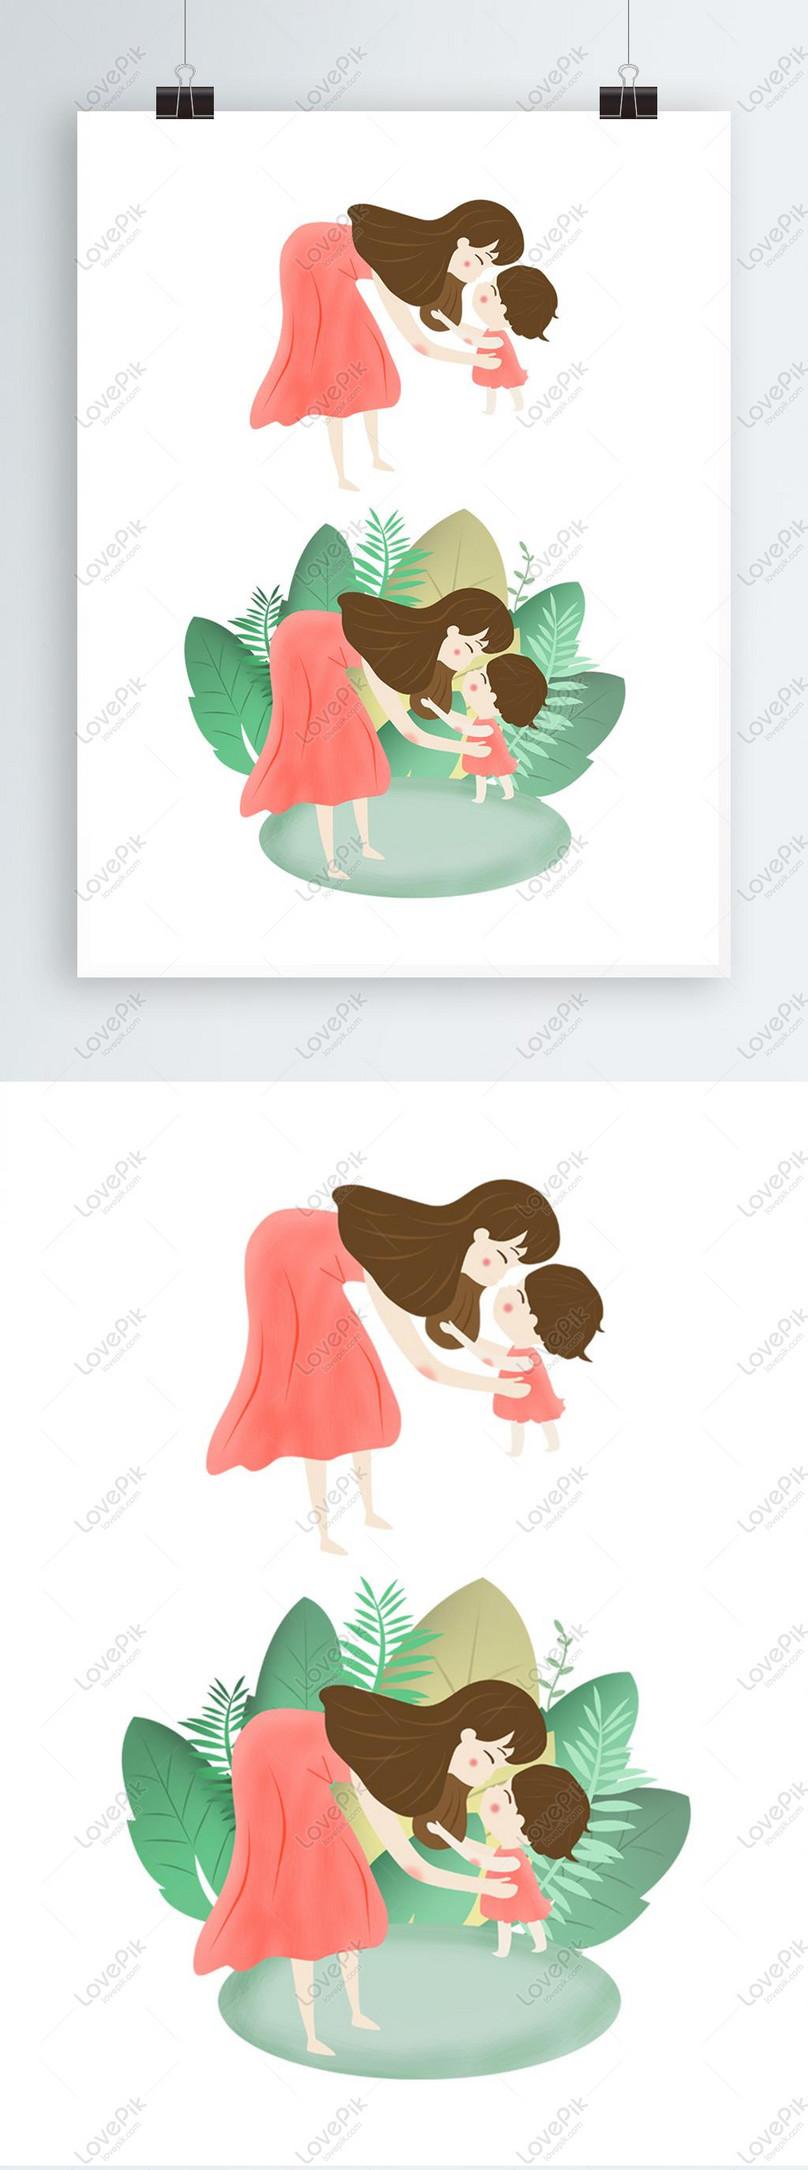 original mothers day illustration elements